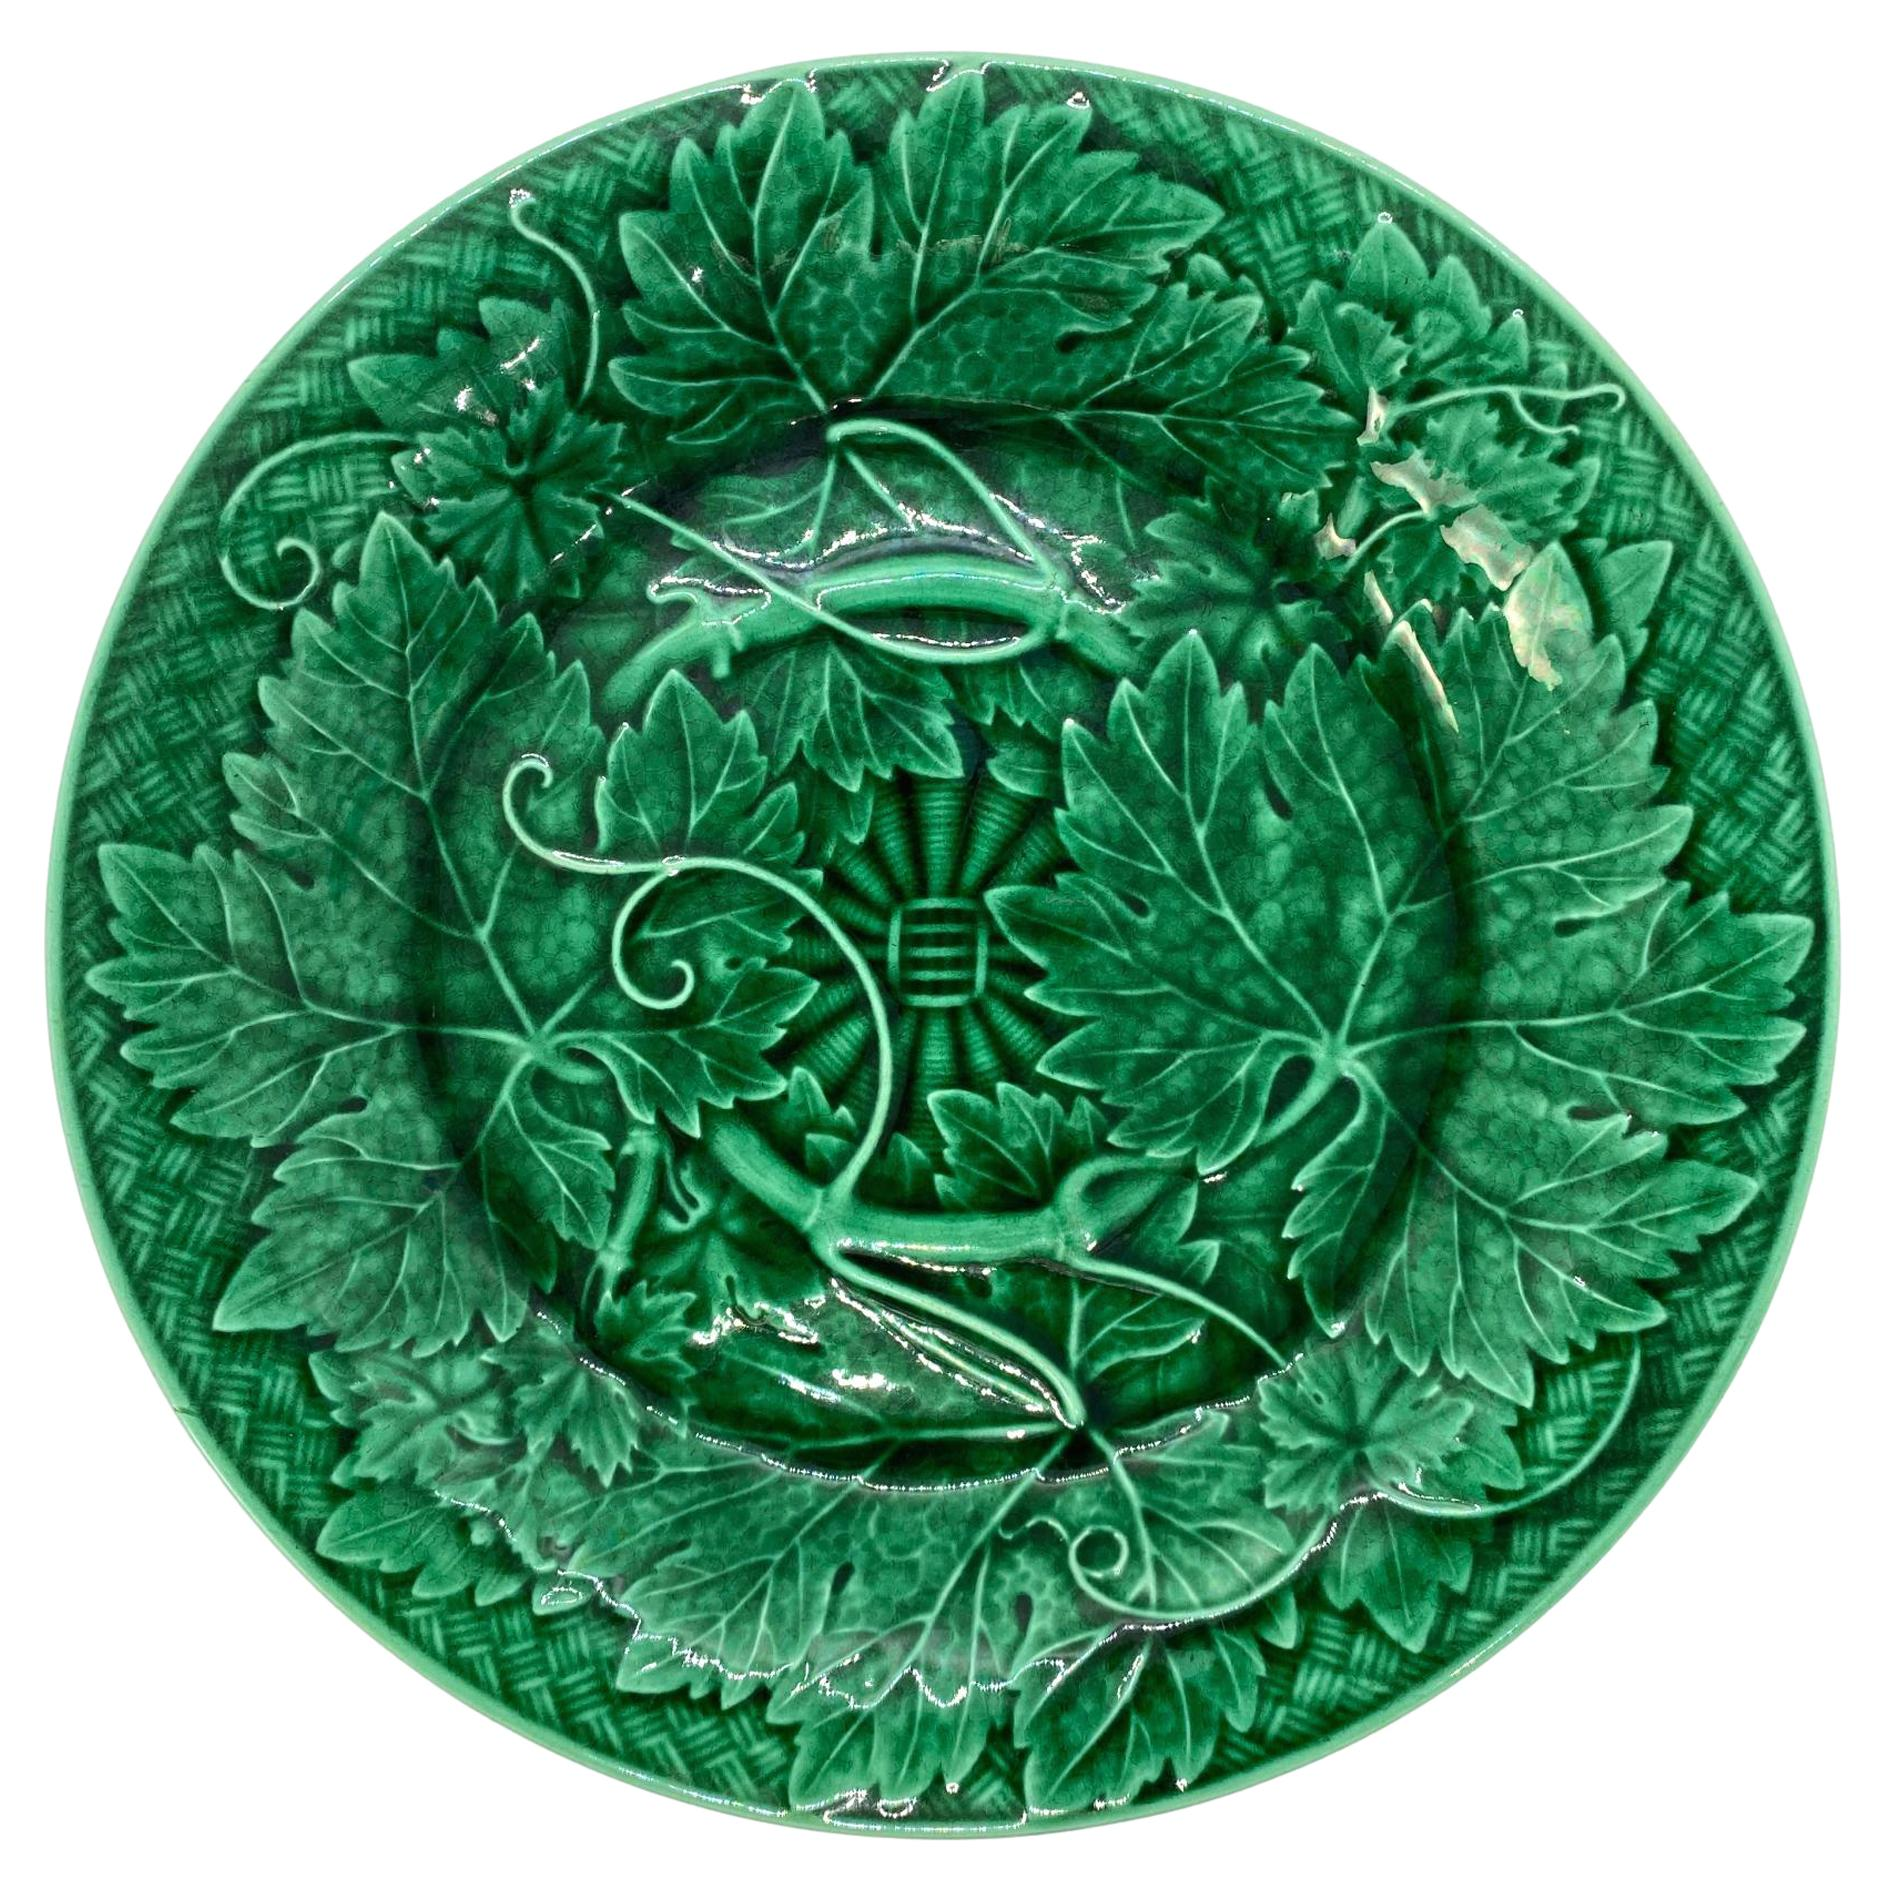 Wedgwood Majolica Green Glazed Basket Weave Plate, English, Dated 1885